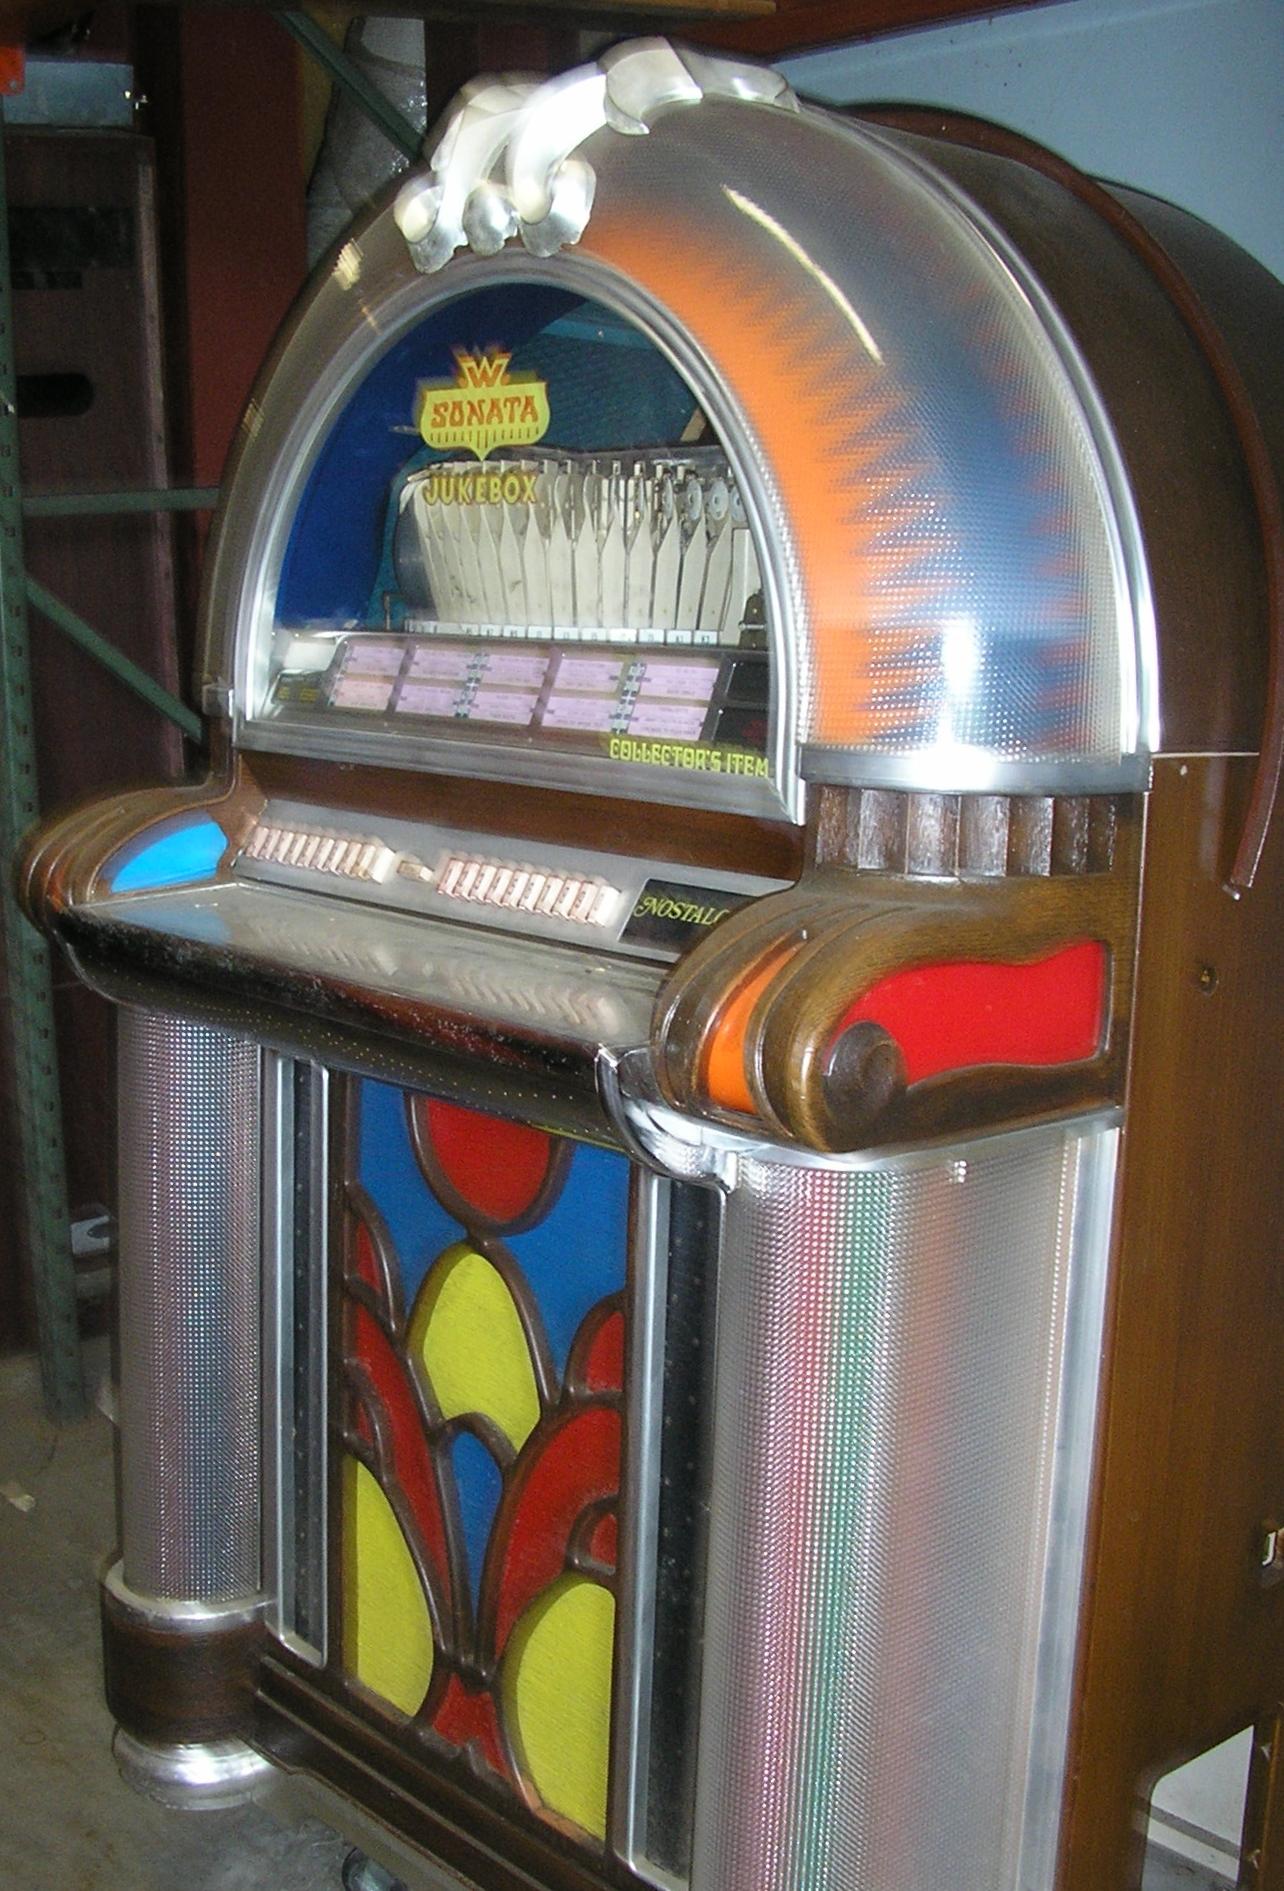 wurlitzer sonata 1050 jukebox for sale